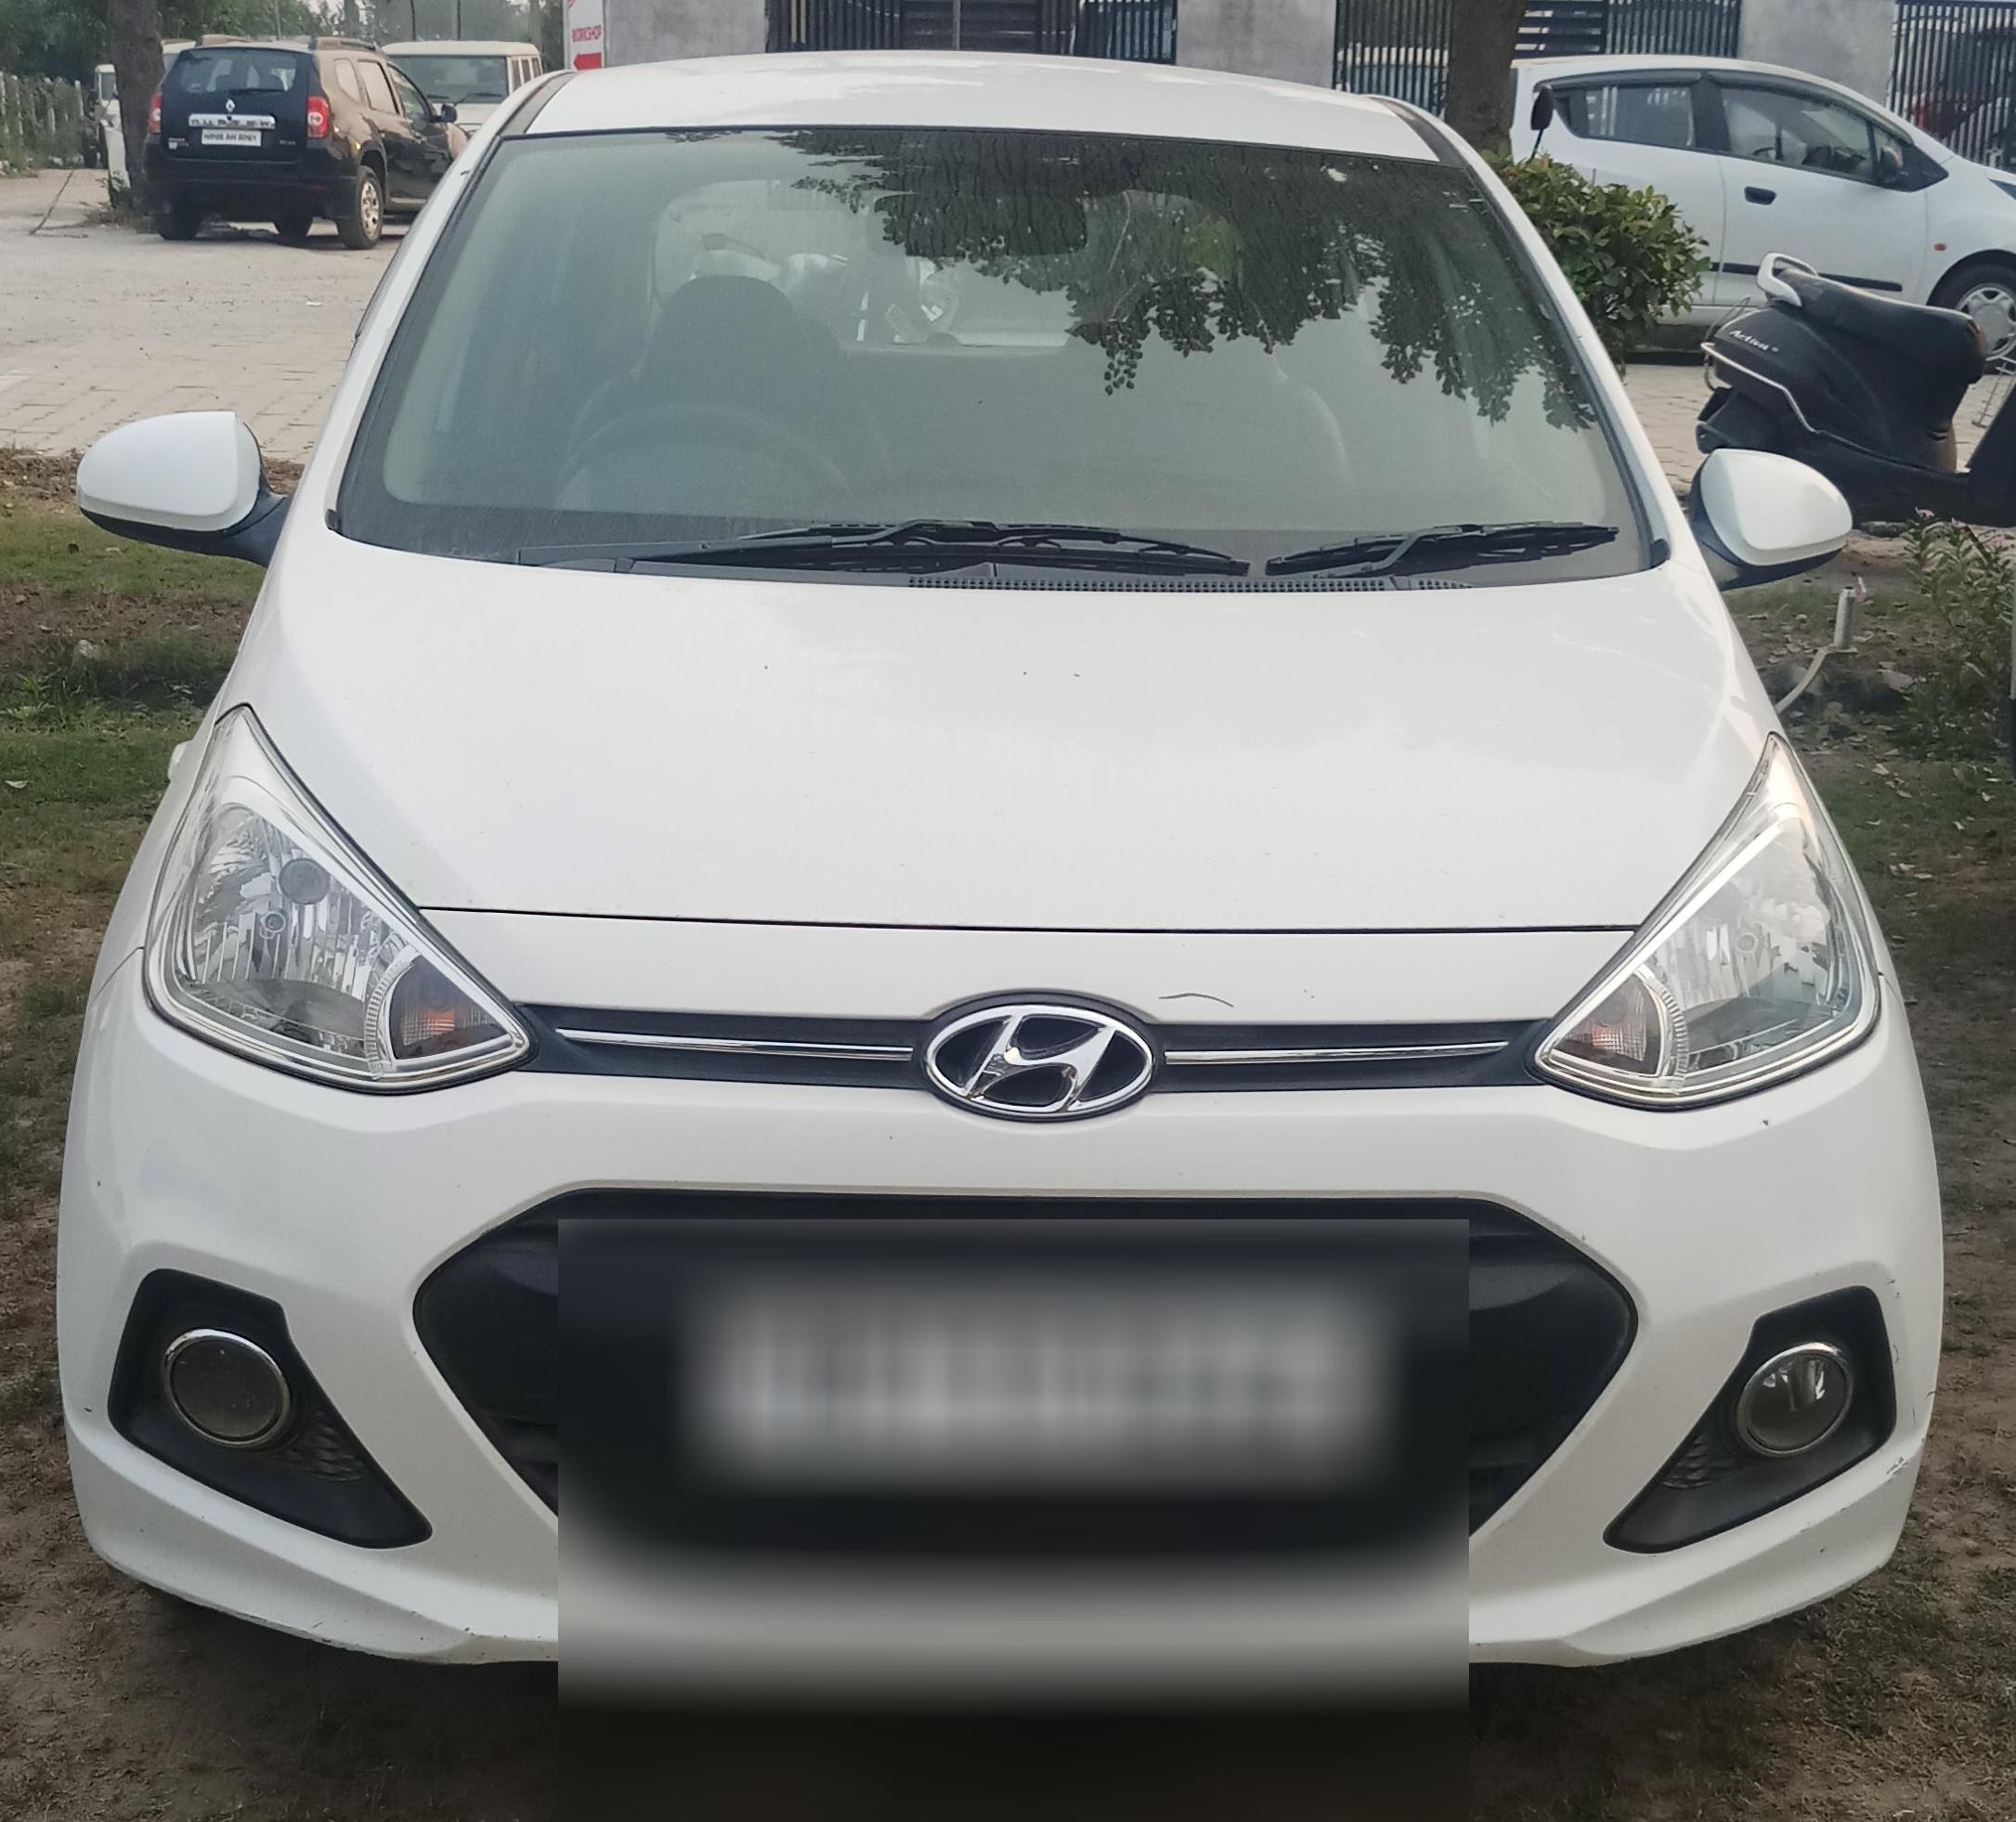 2014 Used Hyundai Grand I10 MAGNA 1.1 CRDI